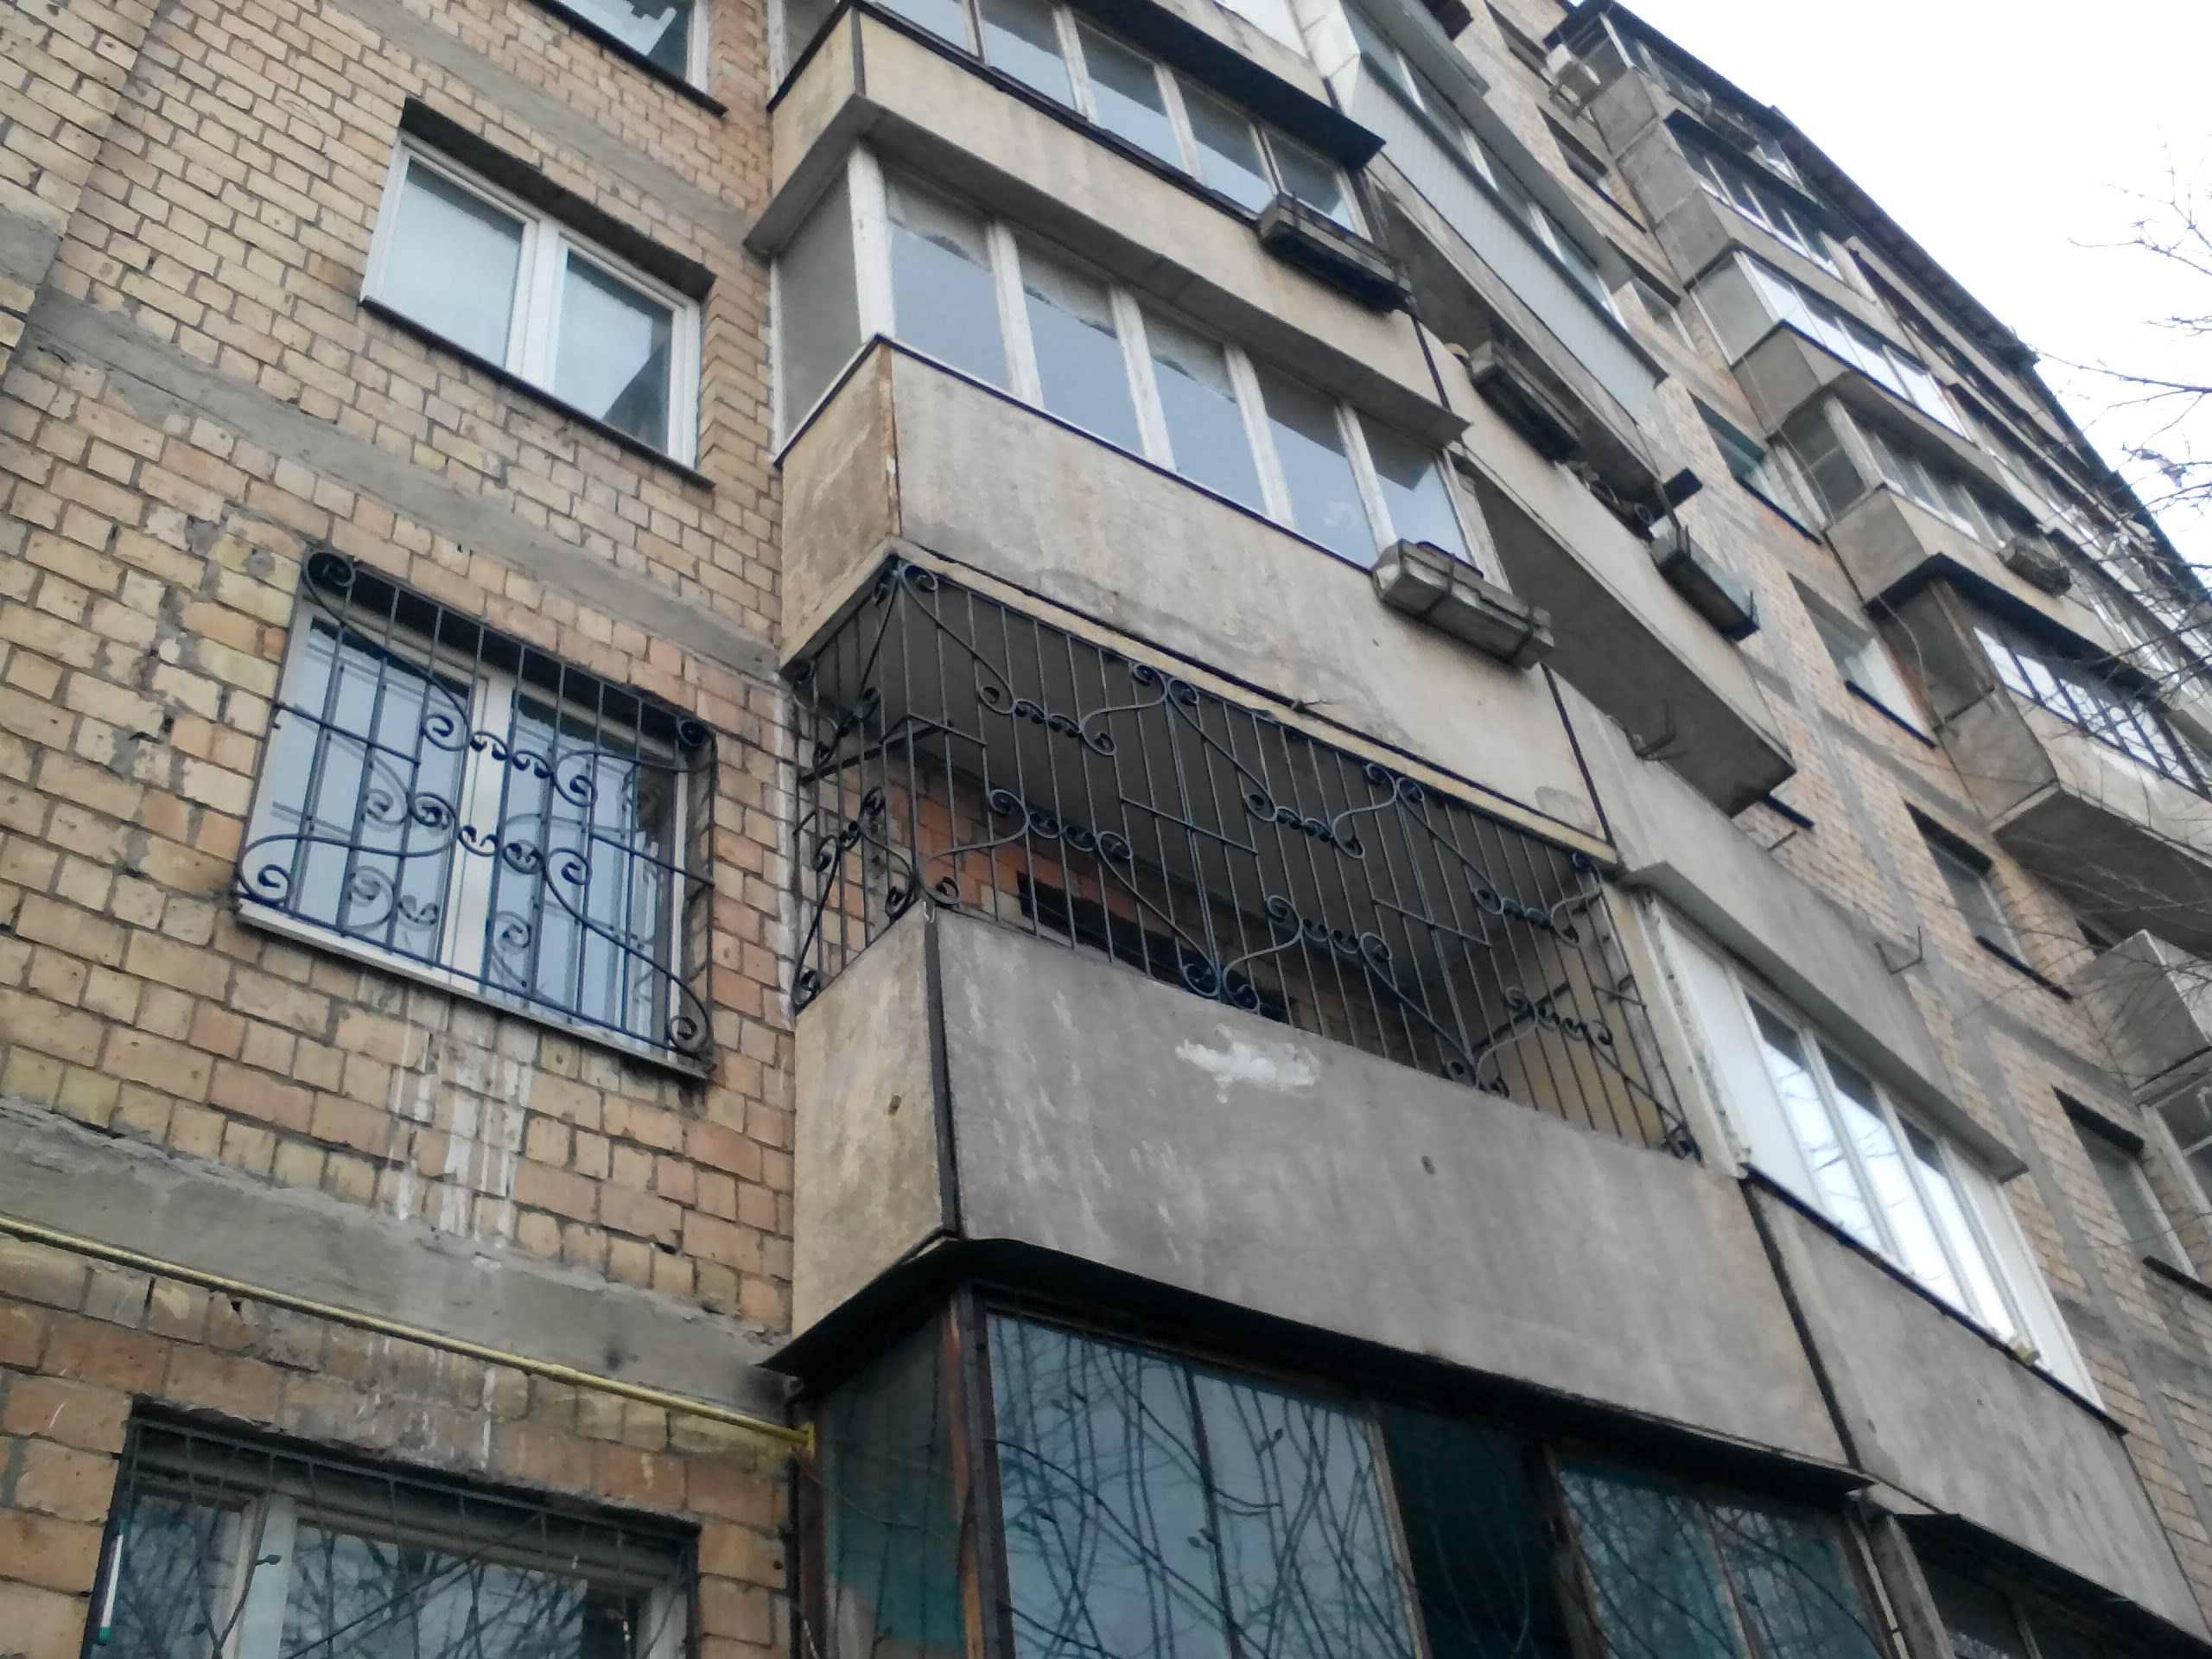 решетки на окна киев, купить решетки на окна киев недорого, киев решетки купить, сварочные работы по решеткам киев, решетки на балкон киев